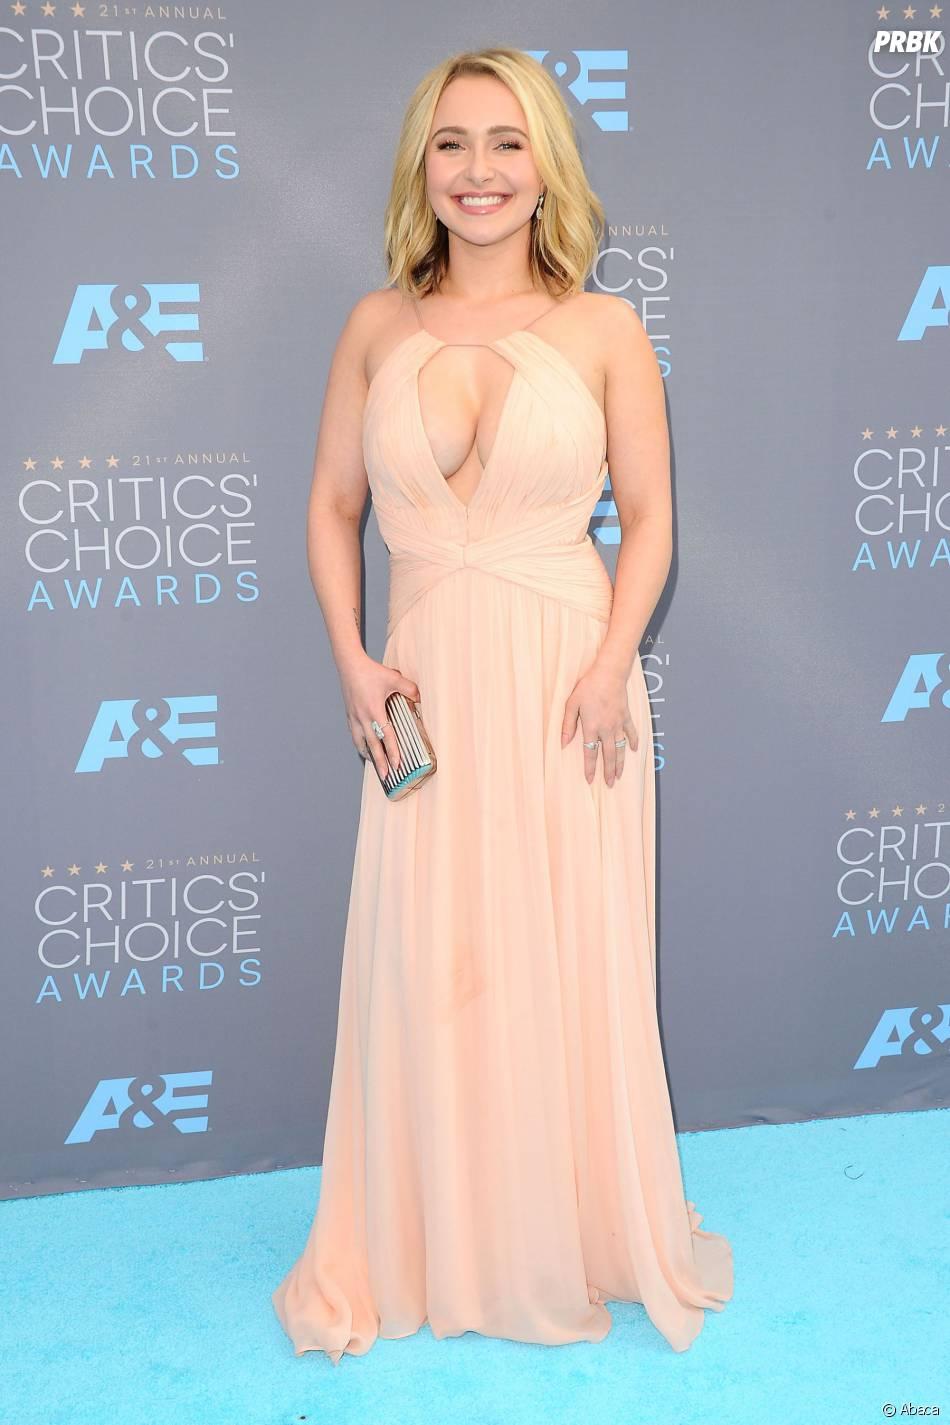 Critics Choice Awards du 17 janvier 2016 : Hayden Panettiere